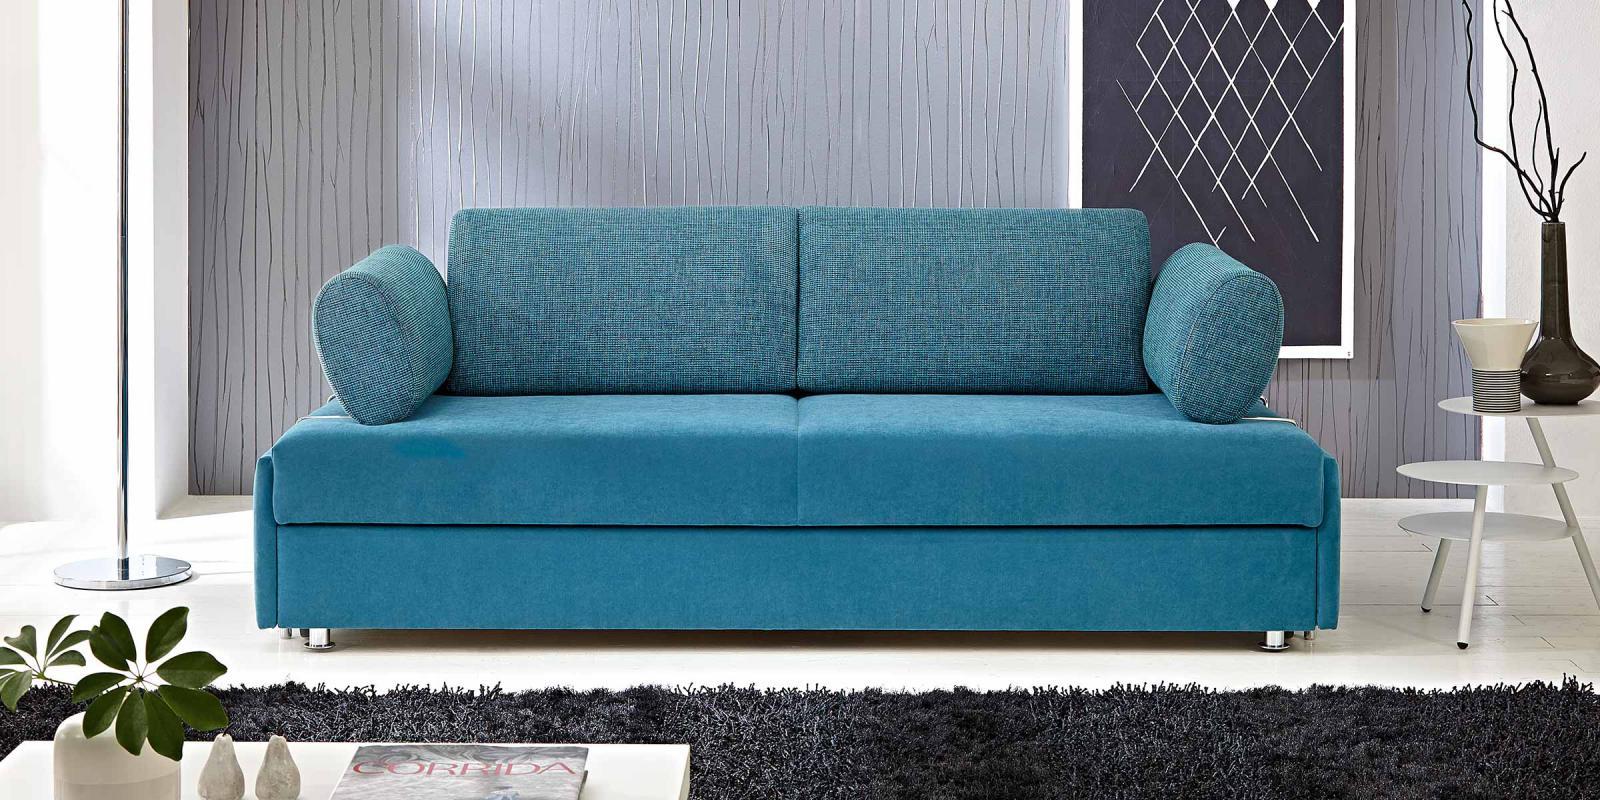 m bel schwab nagold doppelbett sofa schlafsofa bettsofa. Black Bedroom Furniture Sets. Home Design Ideas